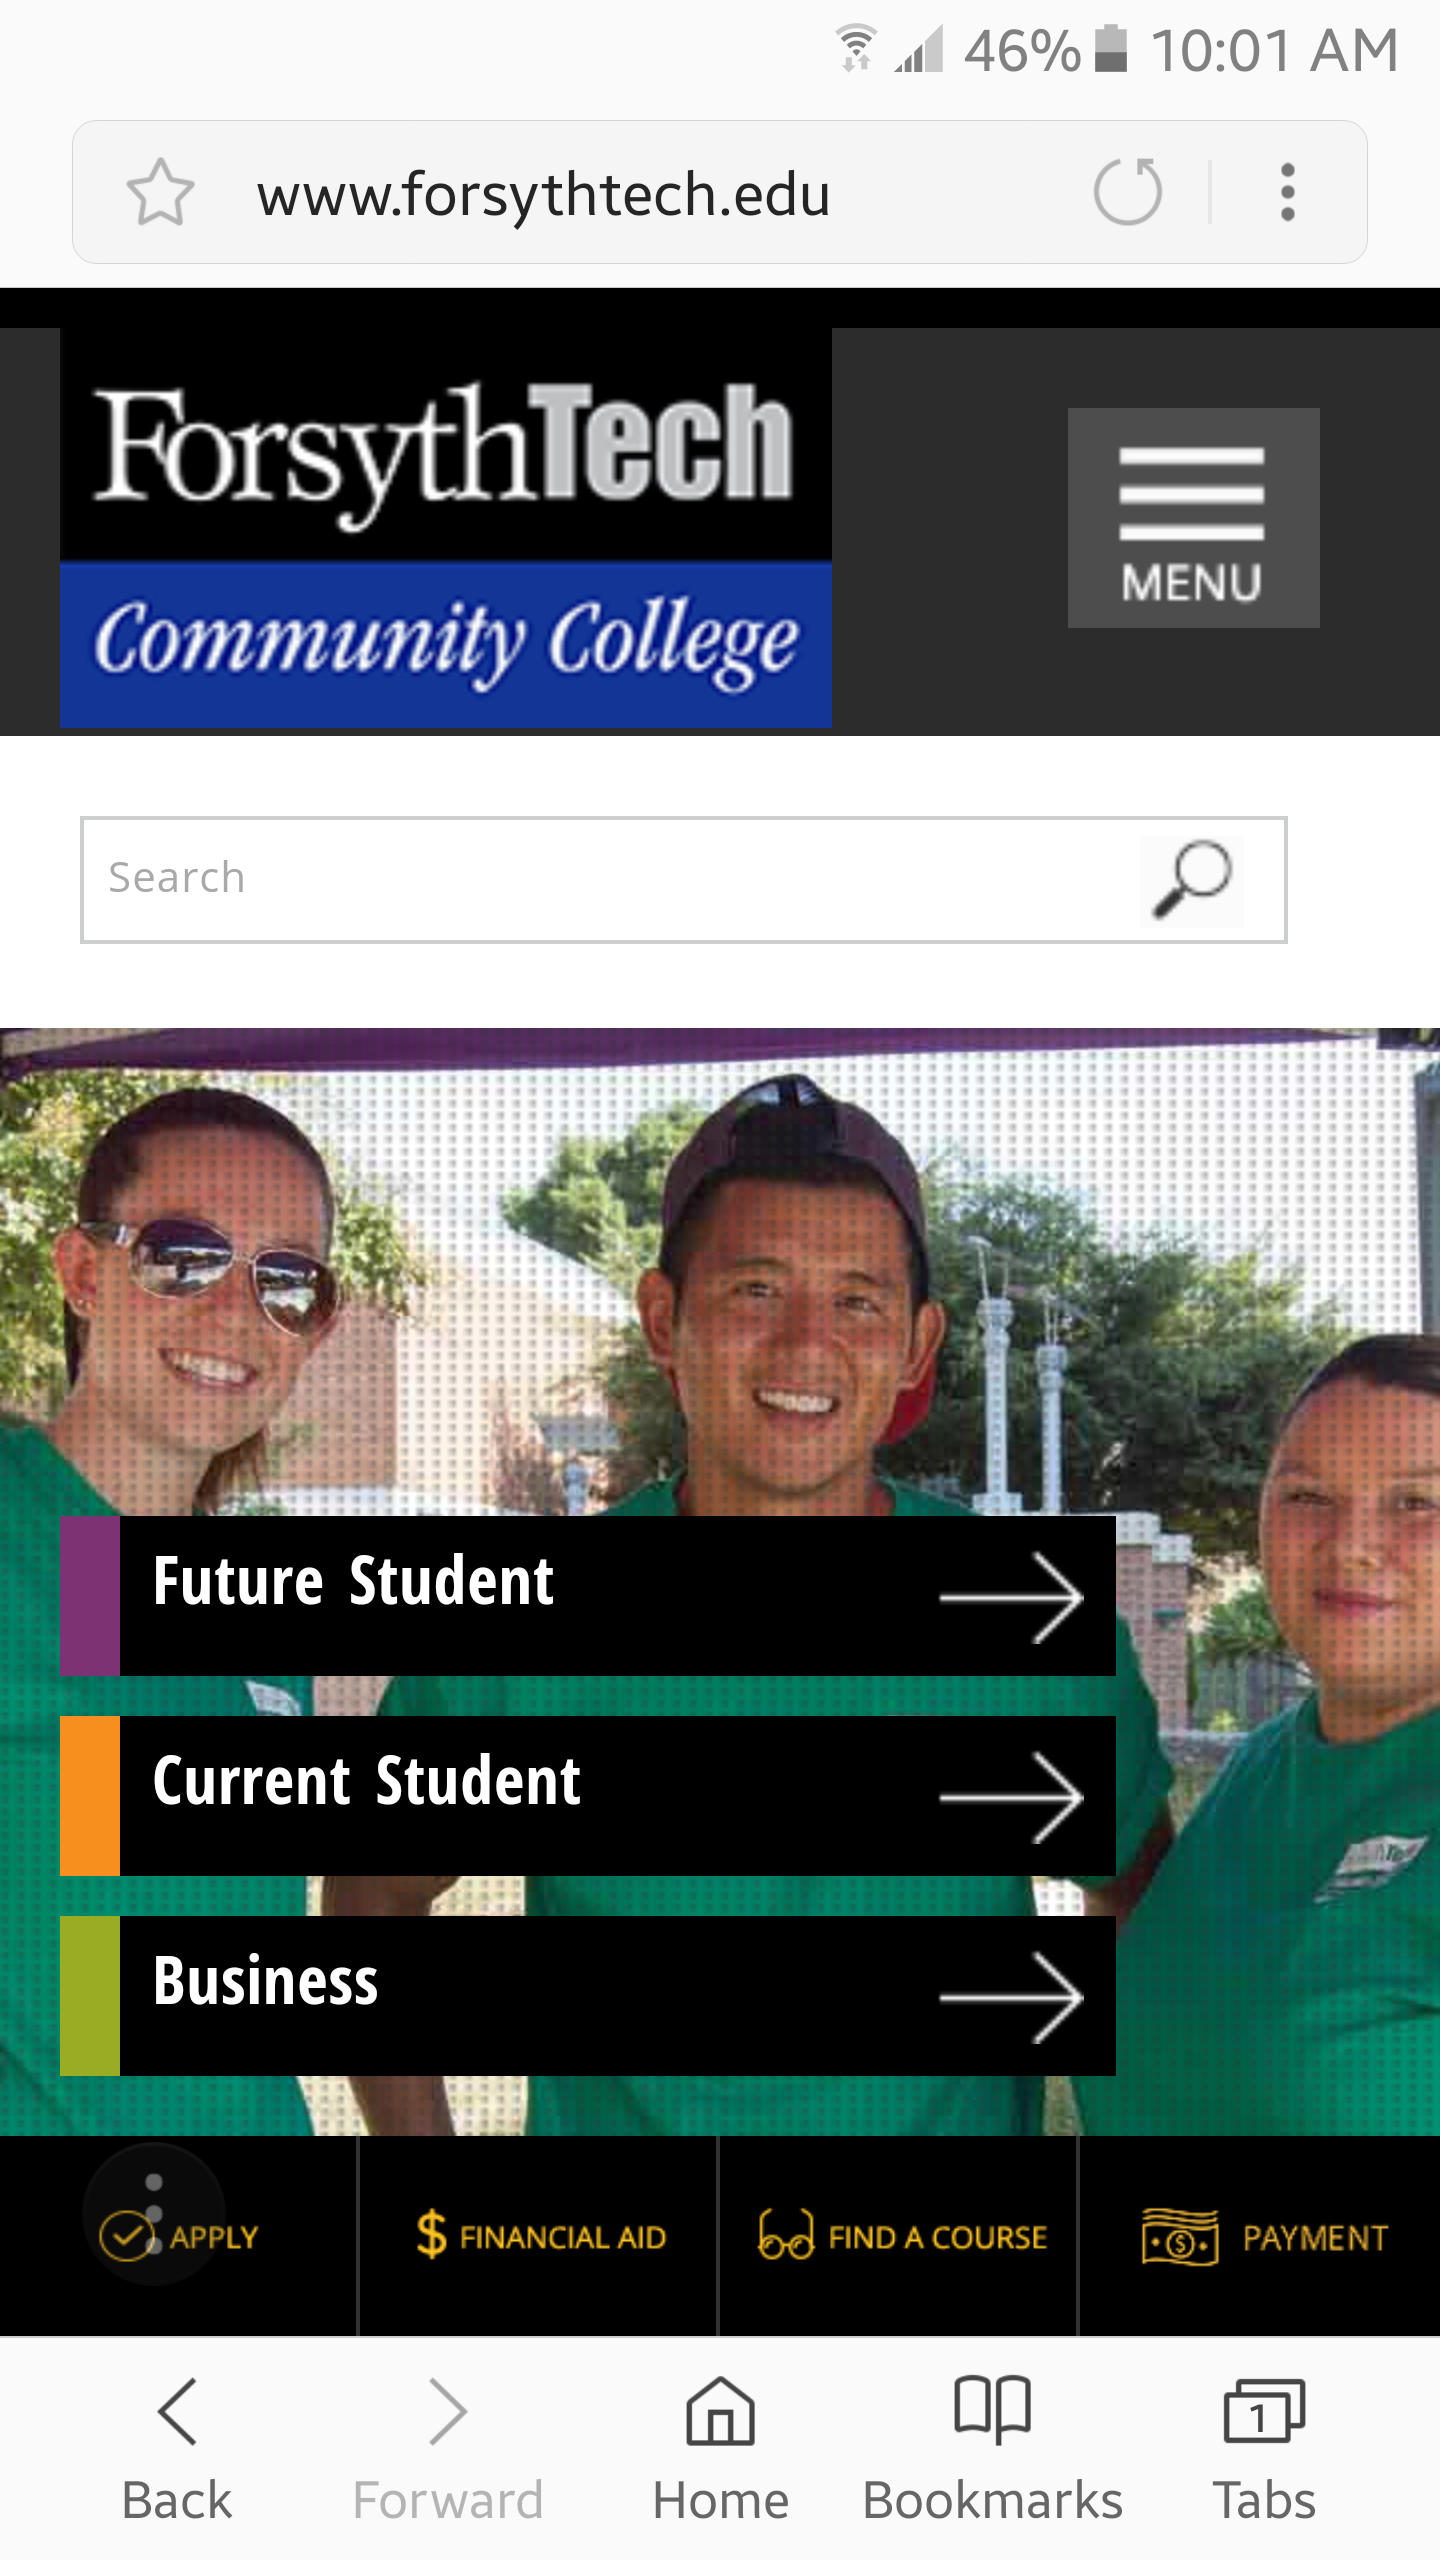 forsythtech.edu homepage